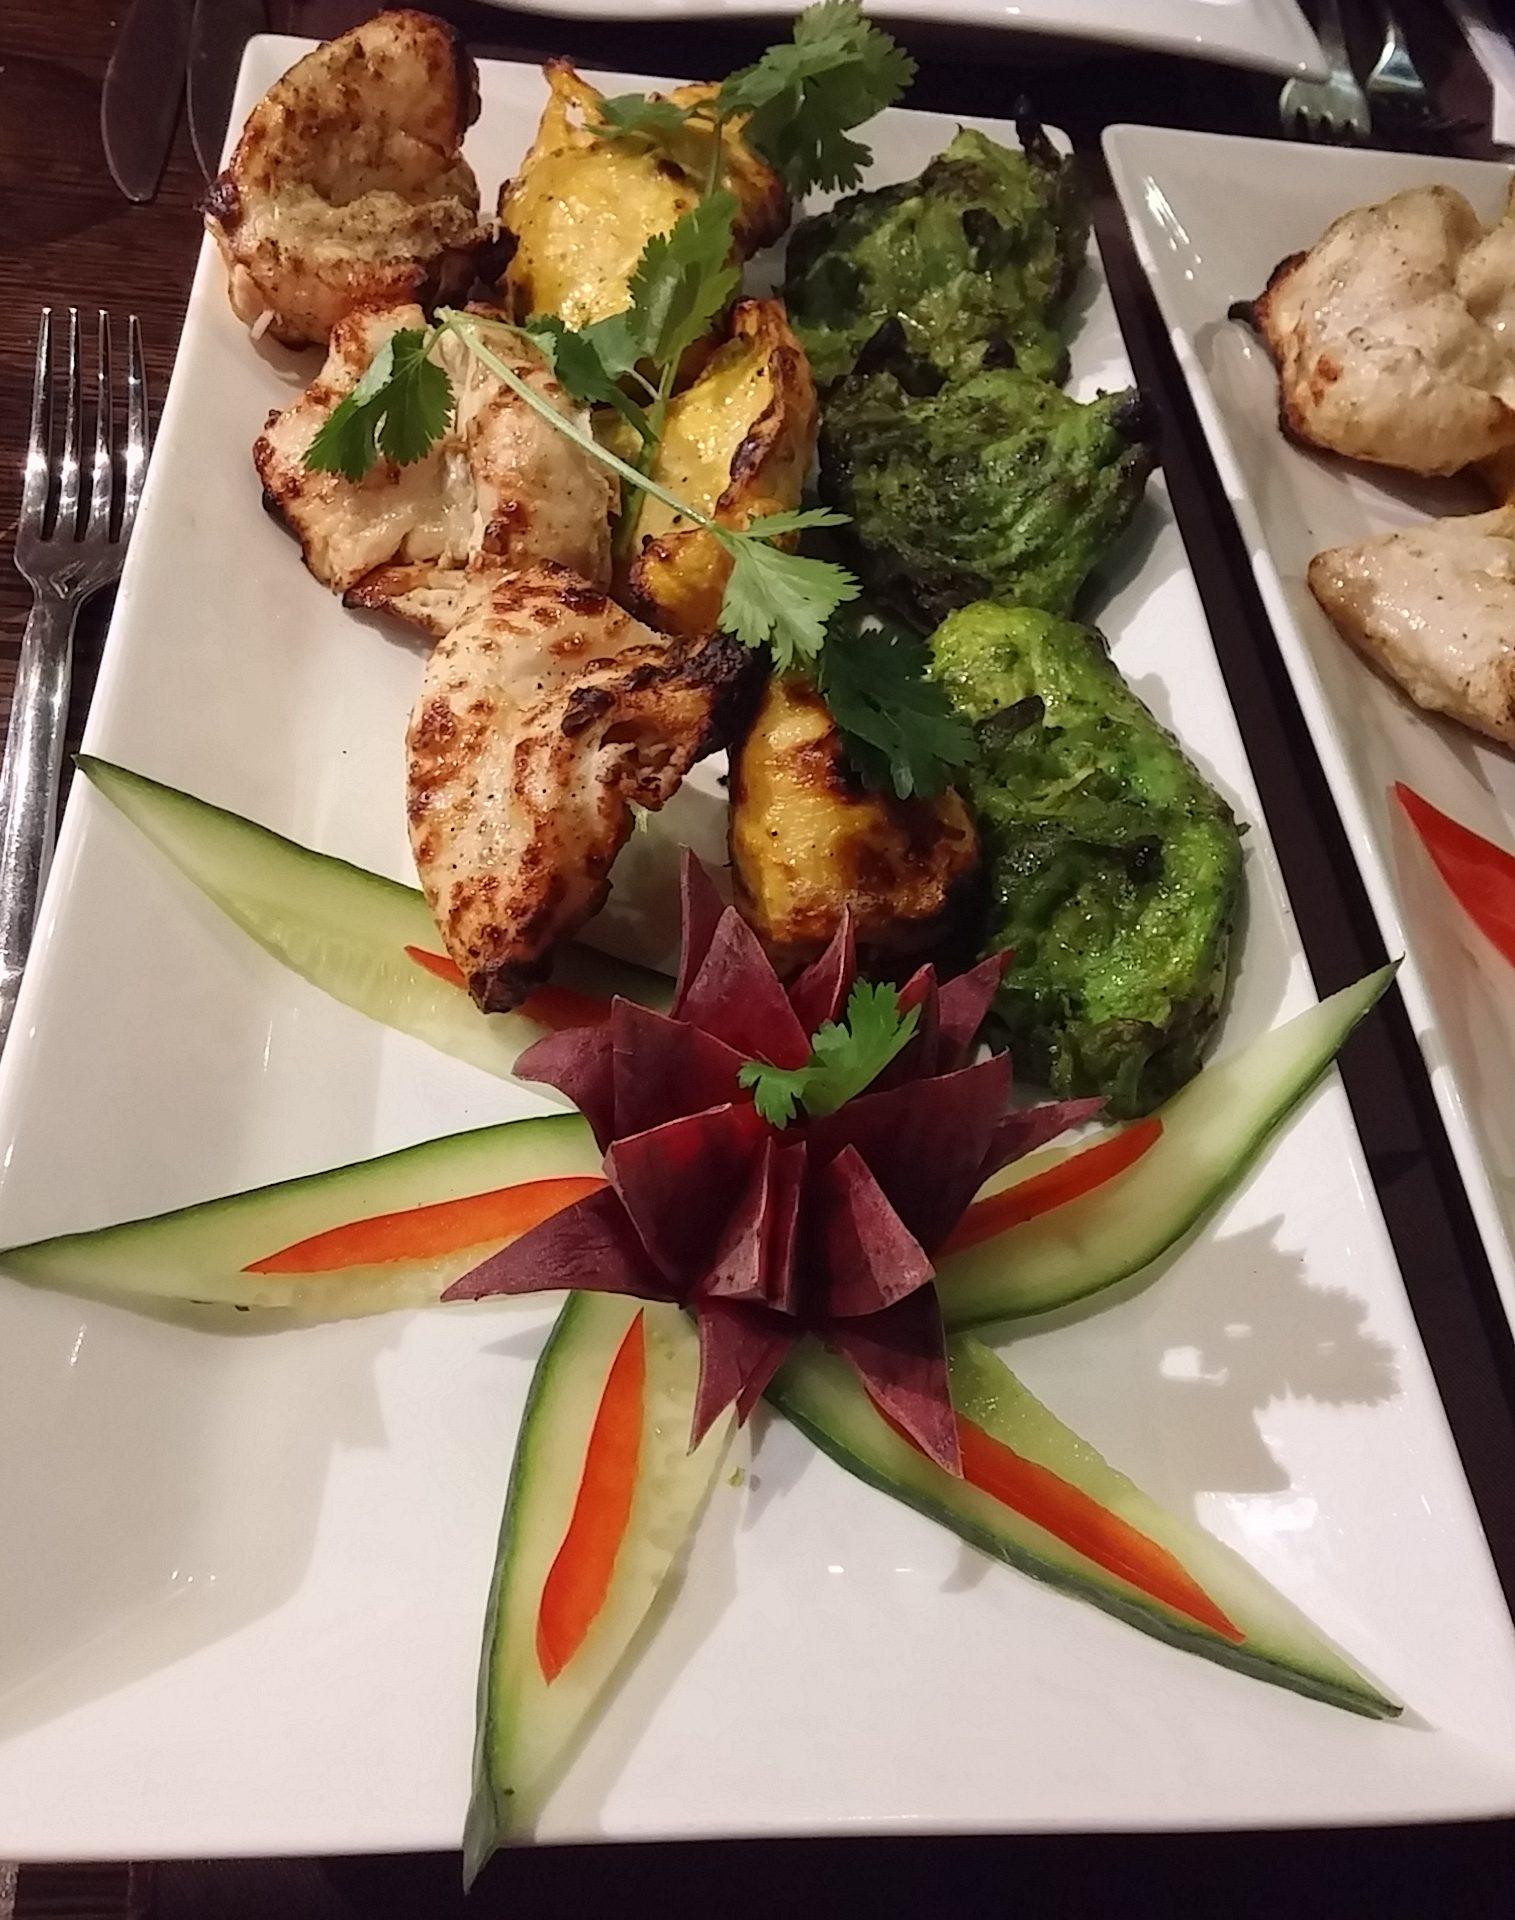 Appetisers of taranga chicken tikka in Indian flag colour: Green: hari chicken tikka (coriander, mint, chilli marinade) White: kaali mirch (black pepper, lychee marinade) Yellow: kesari murgj (saffron infused)